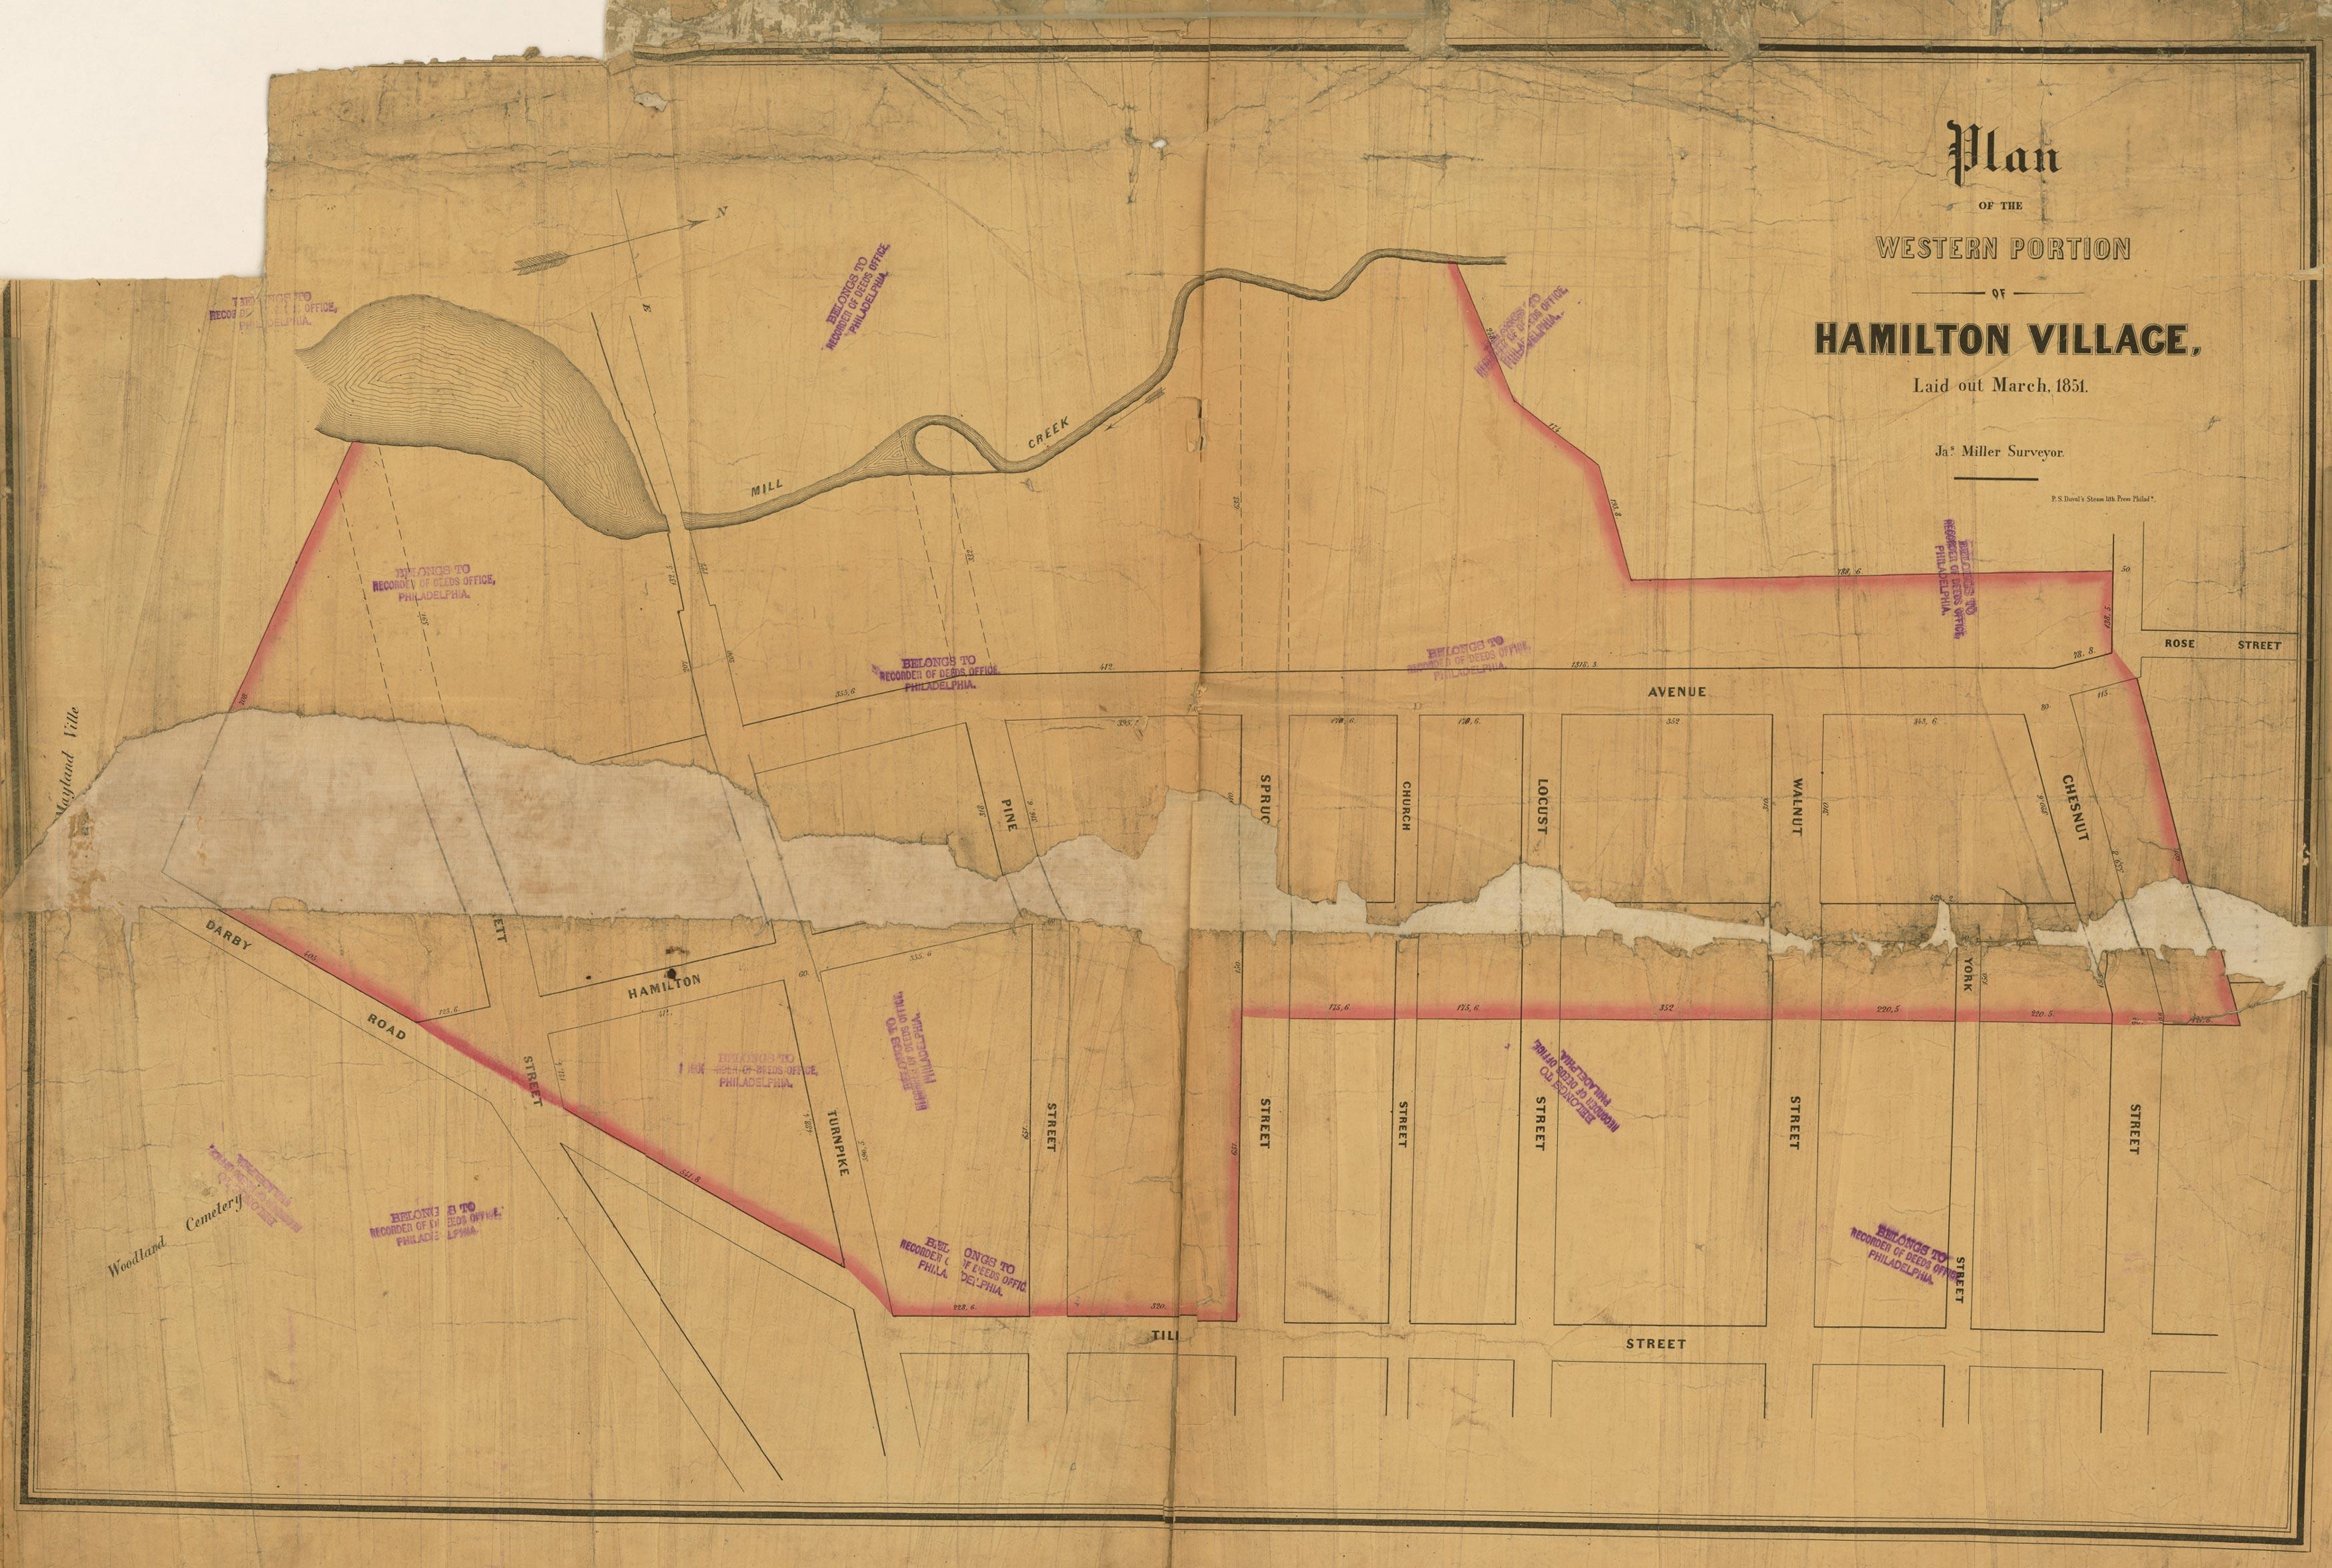 1851 Plan for Western Part of Hamilton Village in West Philadelphia, by Milller